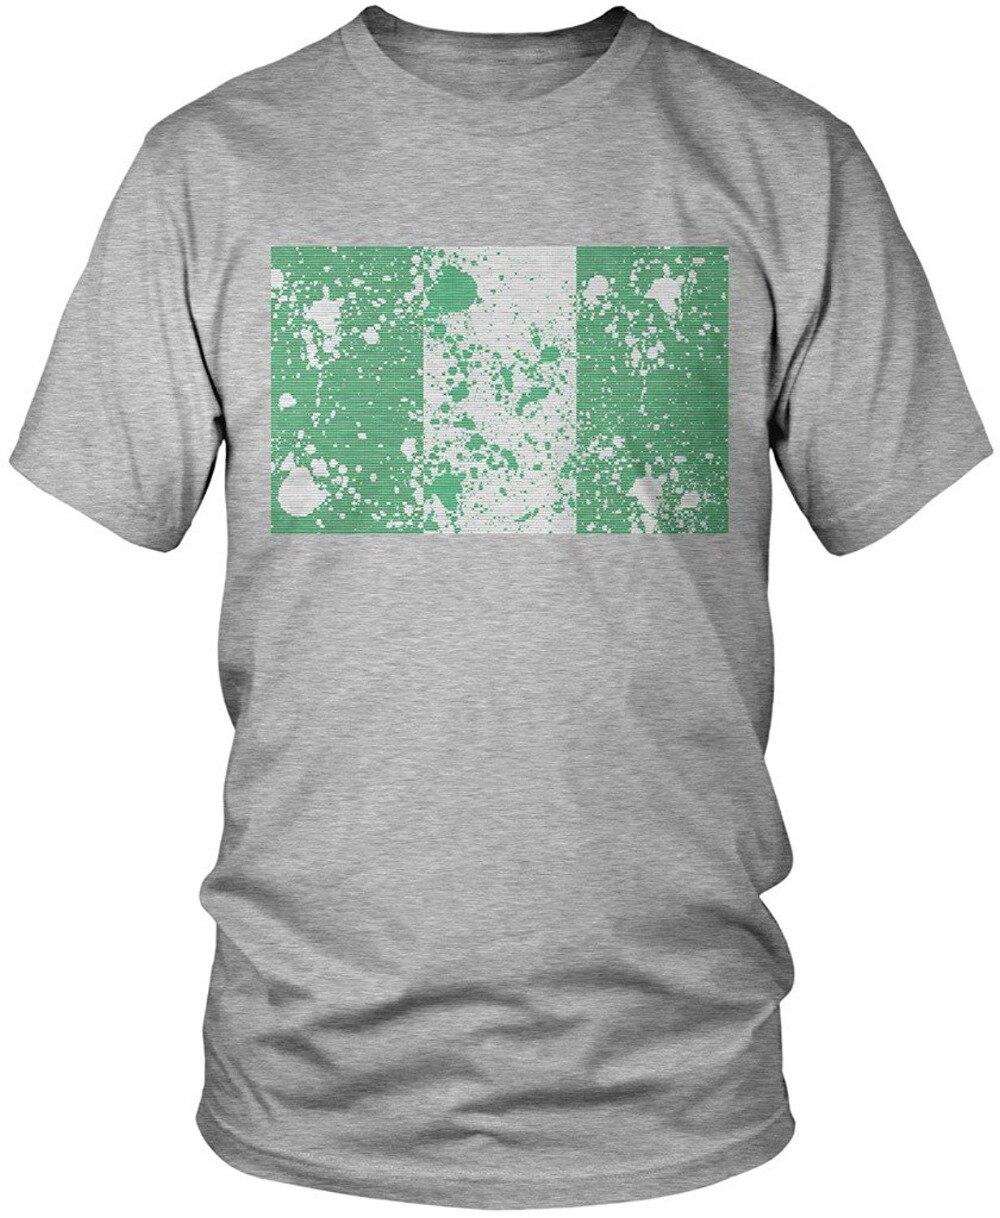 Shirt design in nigeria - 2017 Hot Sale Fashion Nigeria Flag Faded Abstract Nigerian Flag Men Funny Casual Streetwear Hip